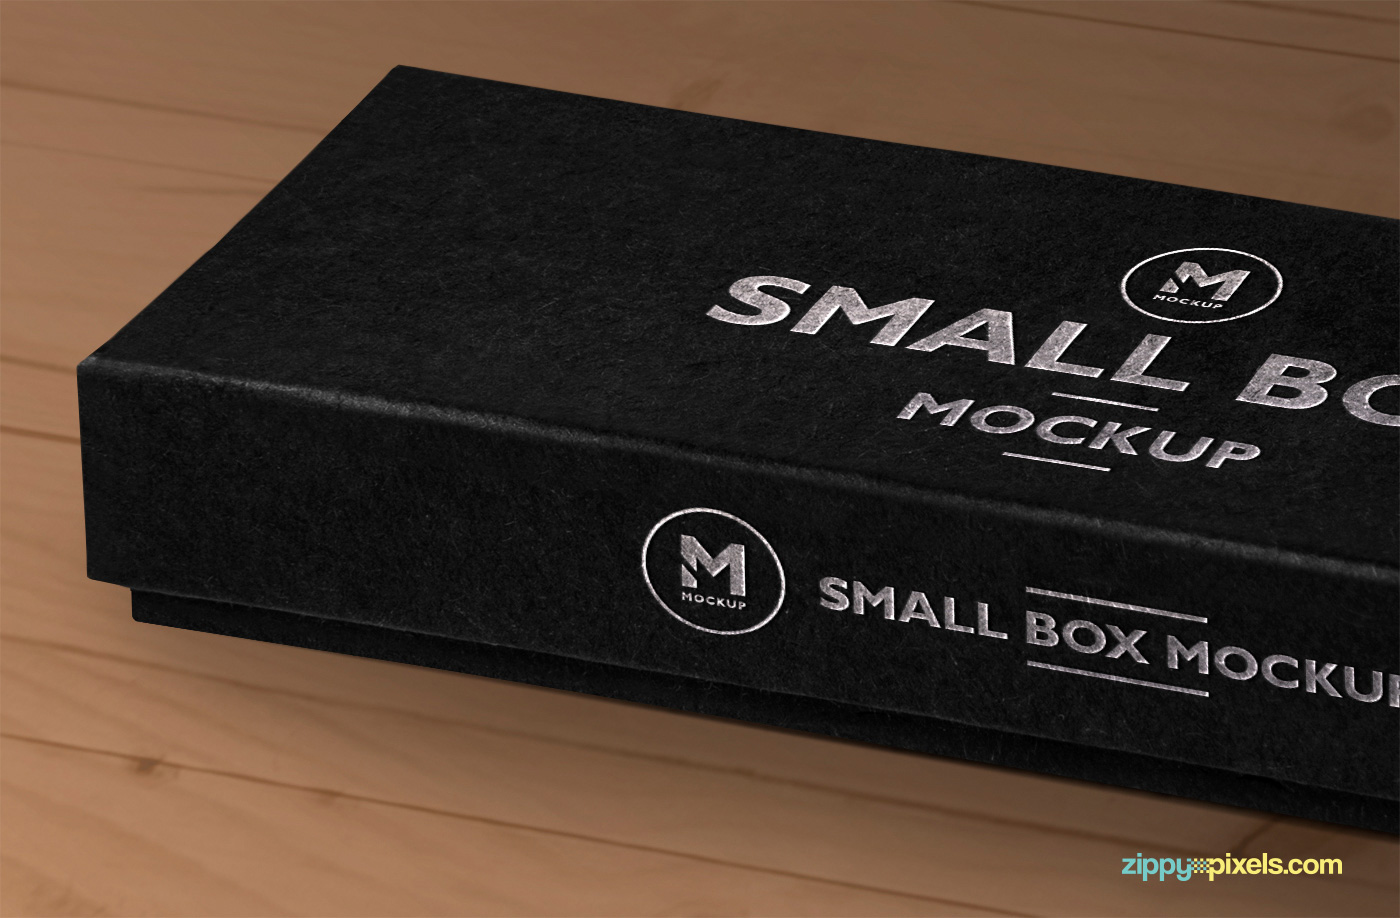 box mockup psd